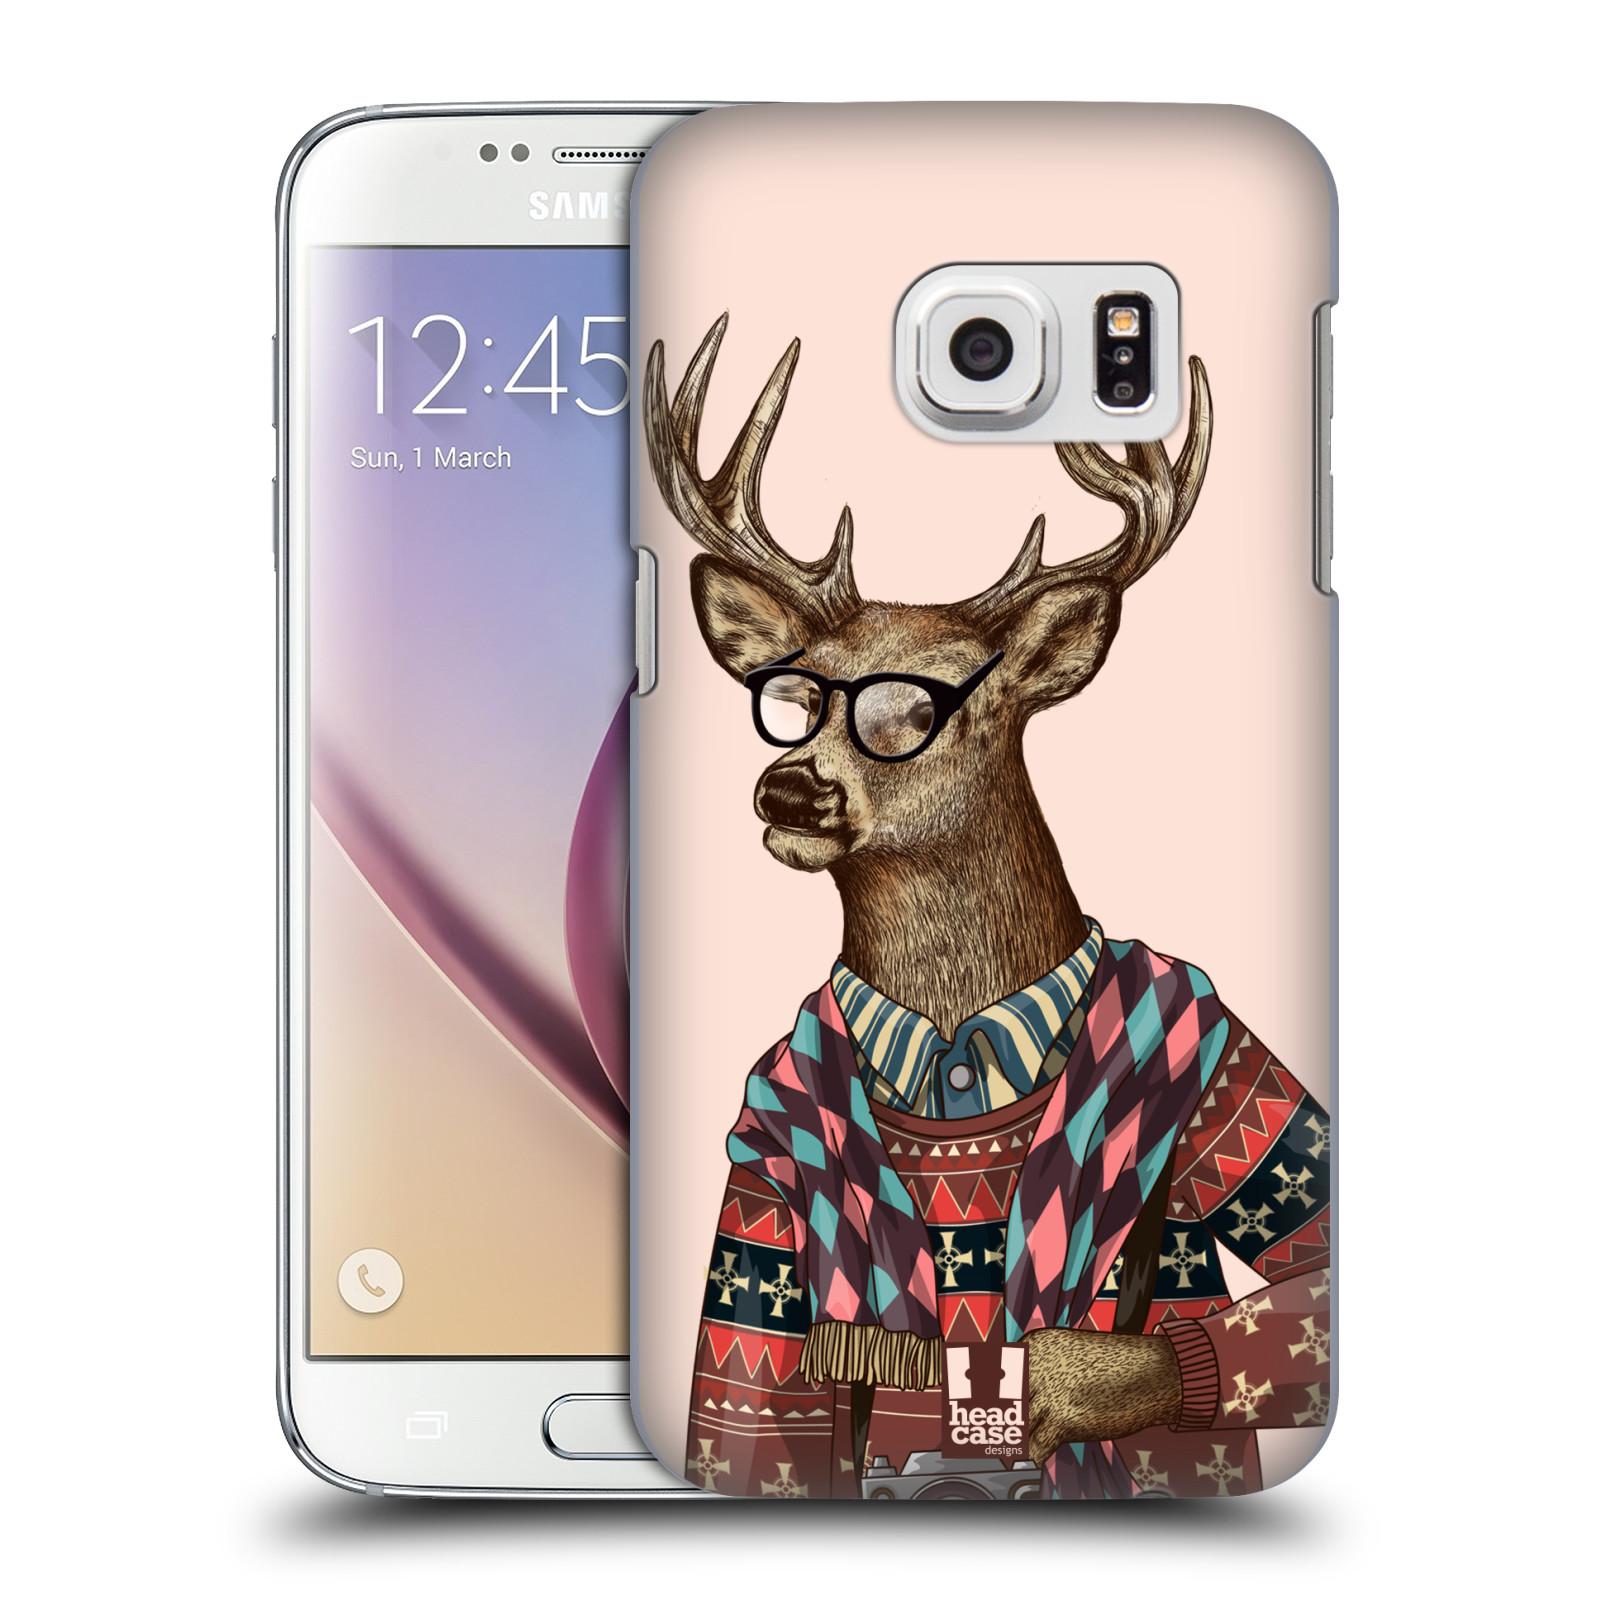 Plastové pouzdro na mobil Samsung Galaxy S7 HEAD CASE HIPSTR SVETR JELEN (Kryt či obal na mobilní telefon Samsung Galaxy S7 SM-G930F)